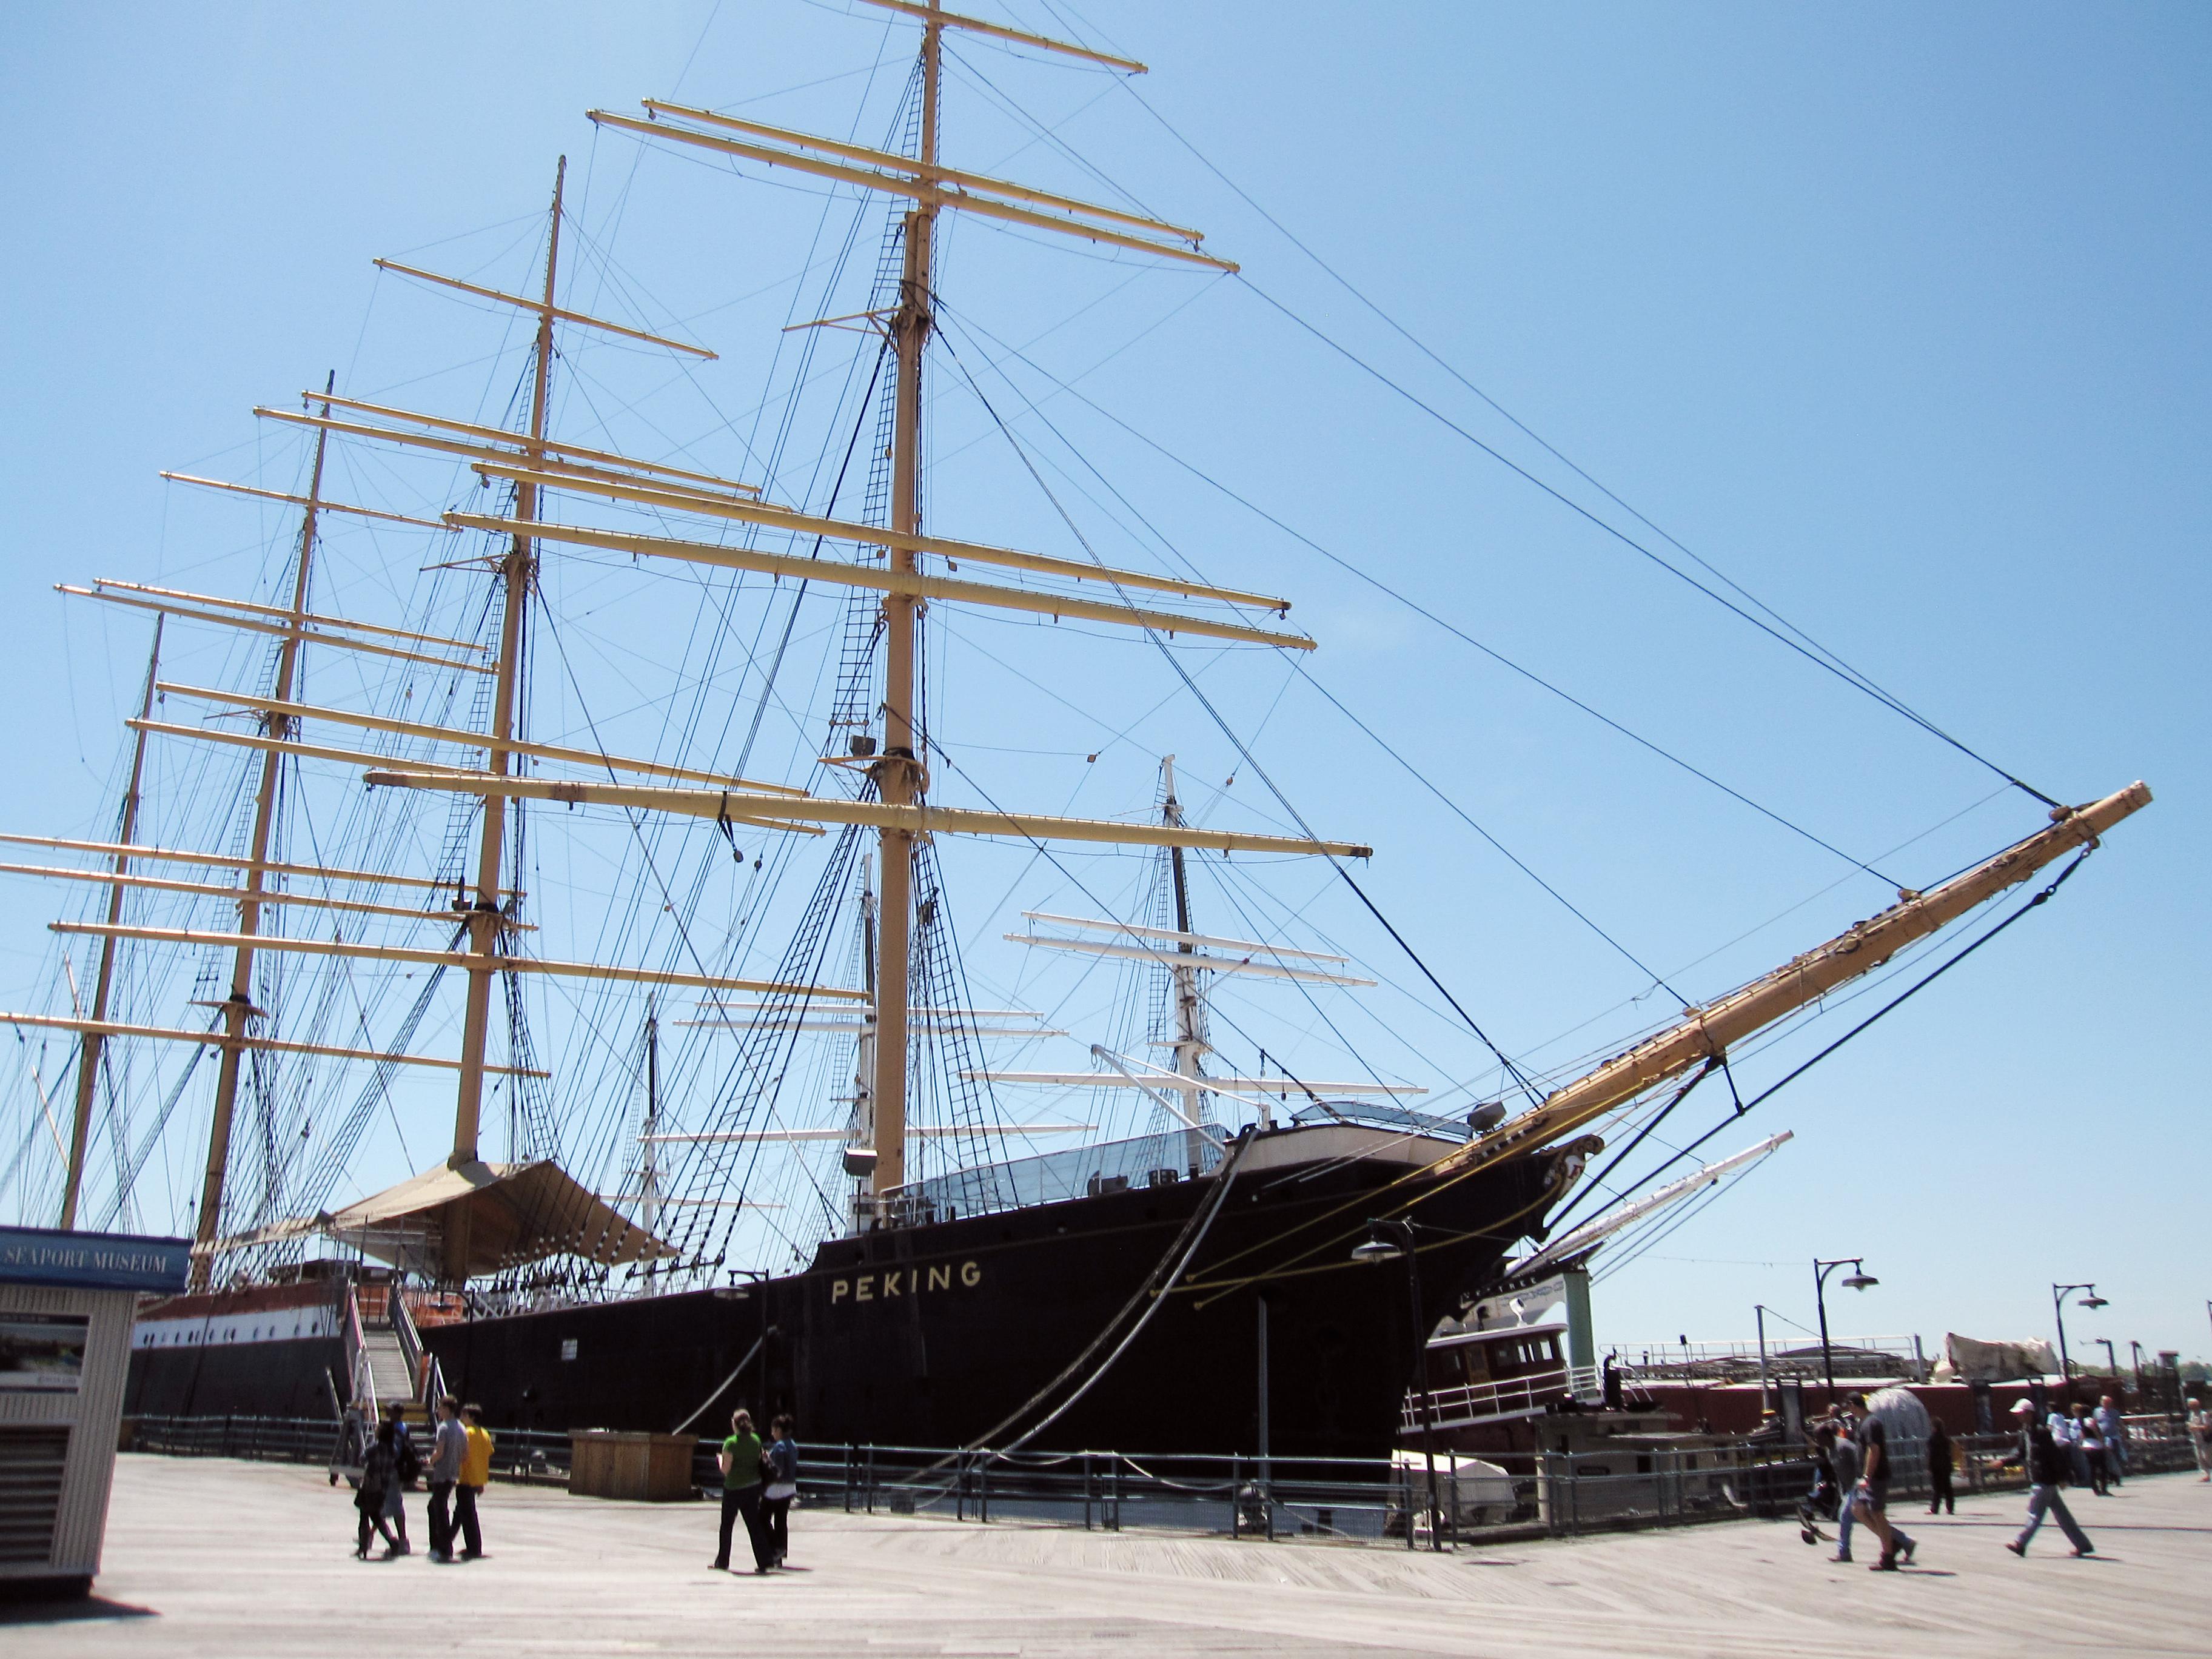 Segelschiff Peking Aktuell